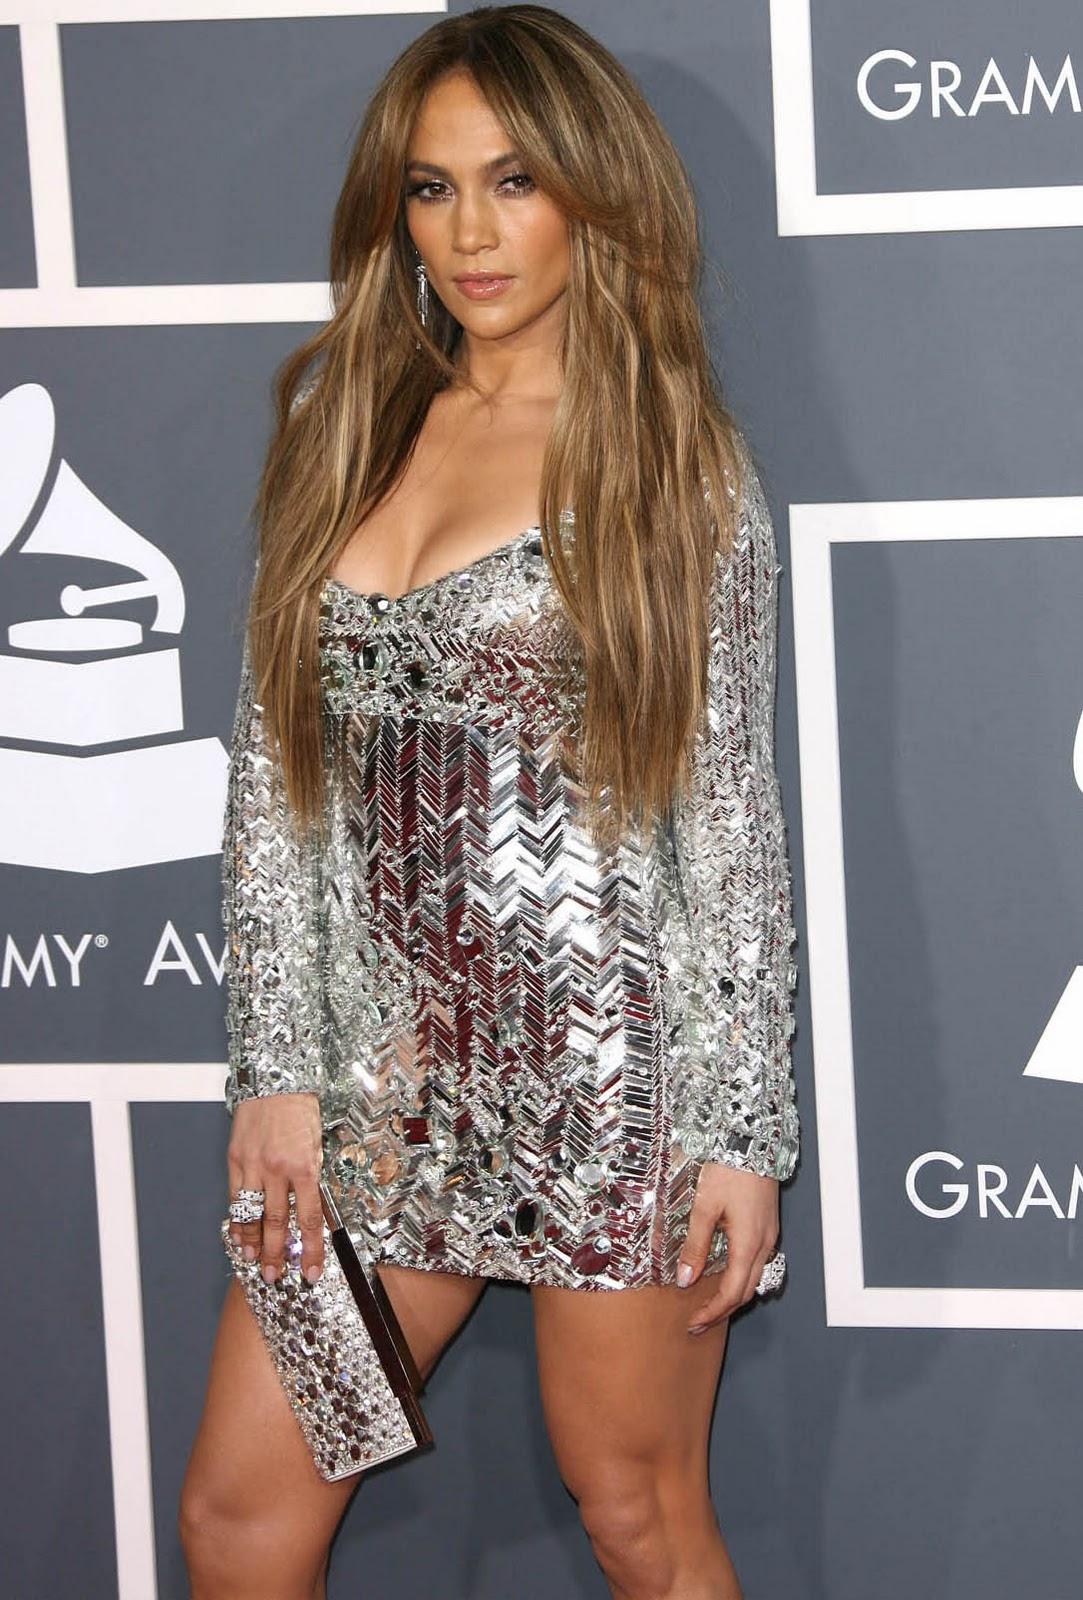 http://3.bp.blogspot.com/-LXDzt2w-BCg/TuEiQrTkNdI/AAAAAAAAAyc/TvcmAE7TDdY/s1600/jennifer_lopez_grammy_dress.jpg